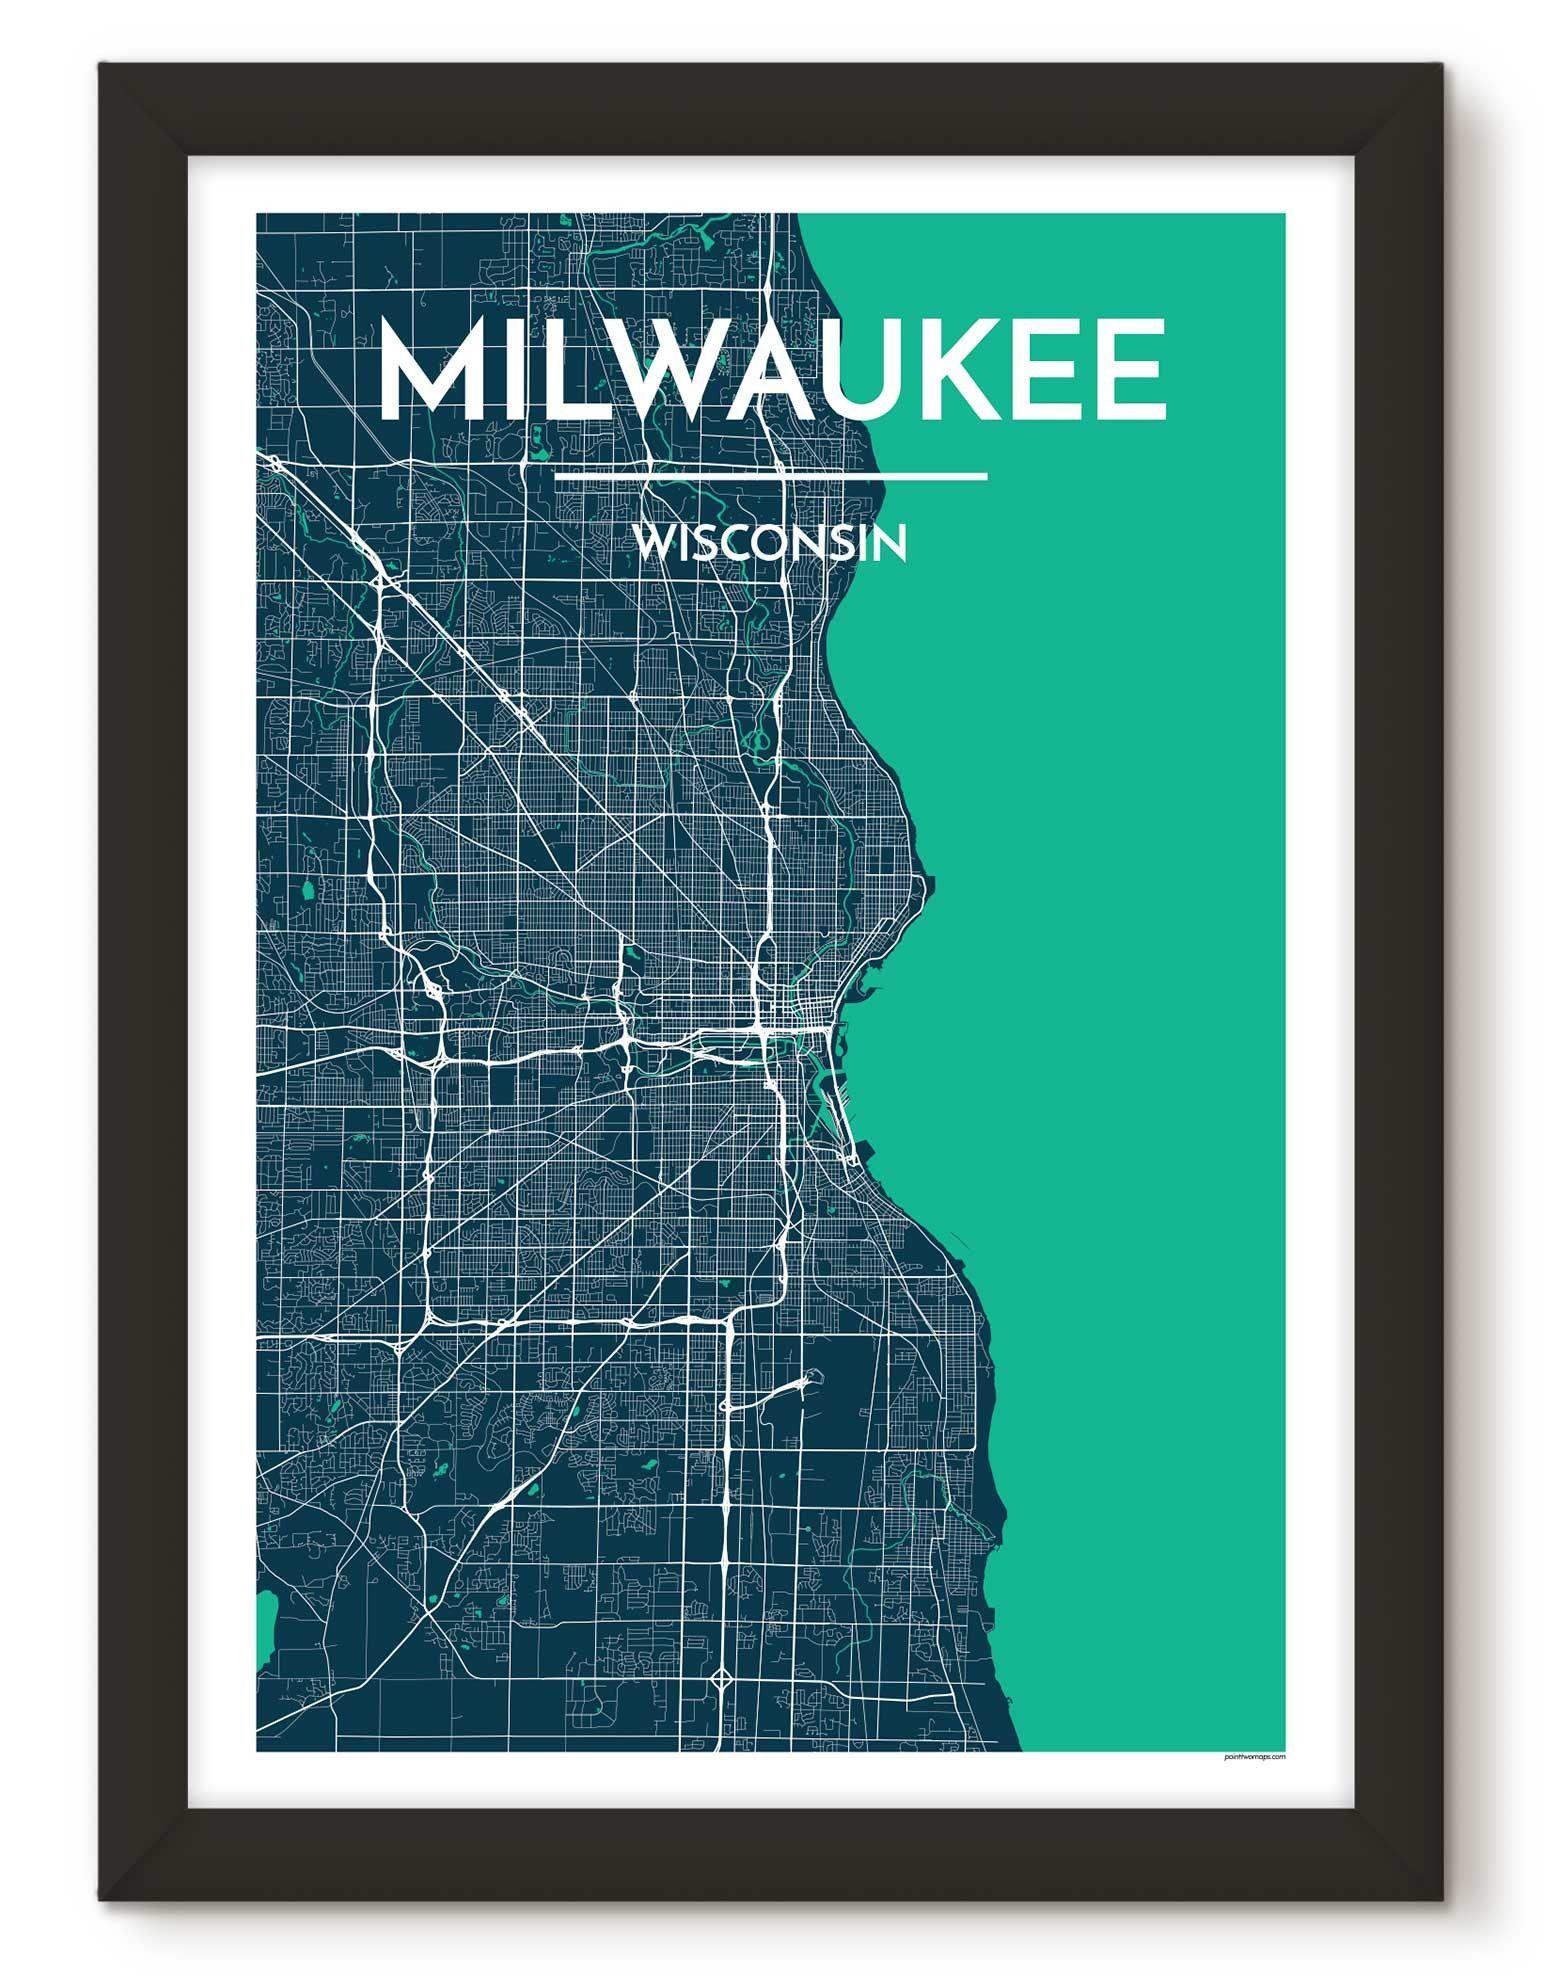 Milwaukee City Map   Products   Pinterest   Milwaukee city, City ...